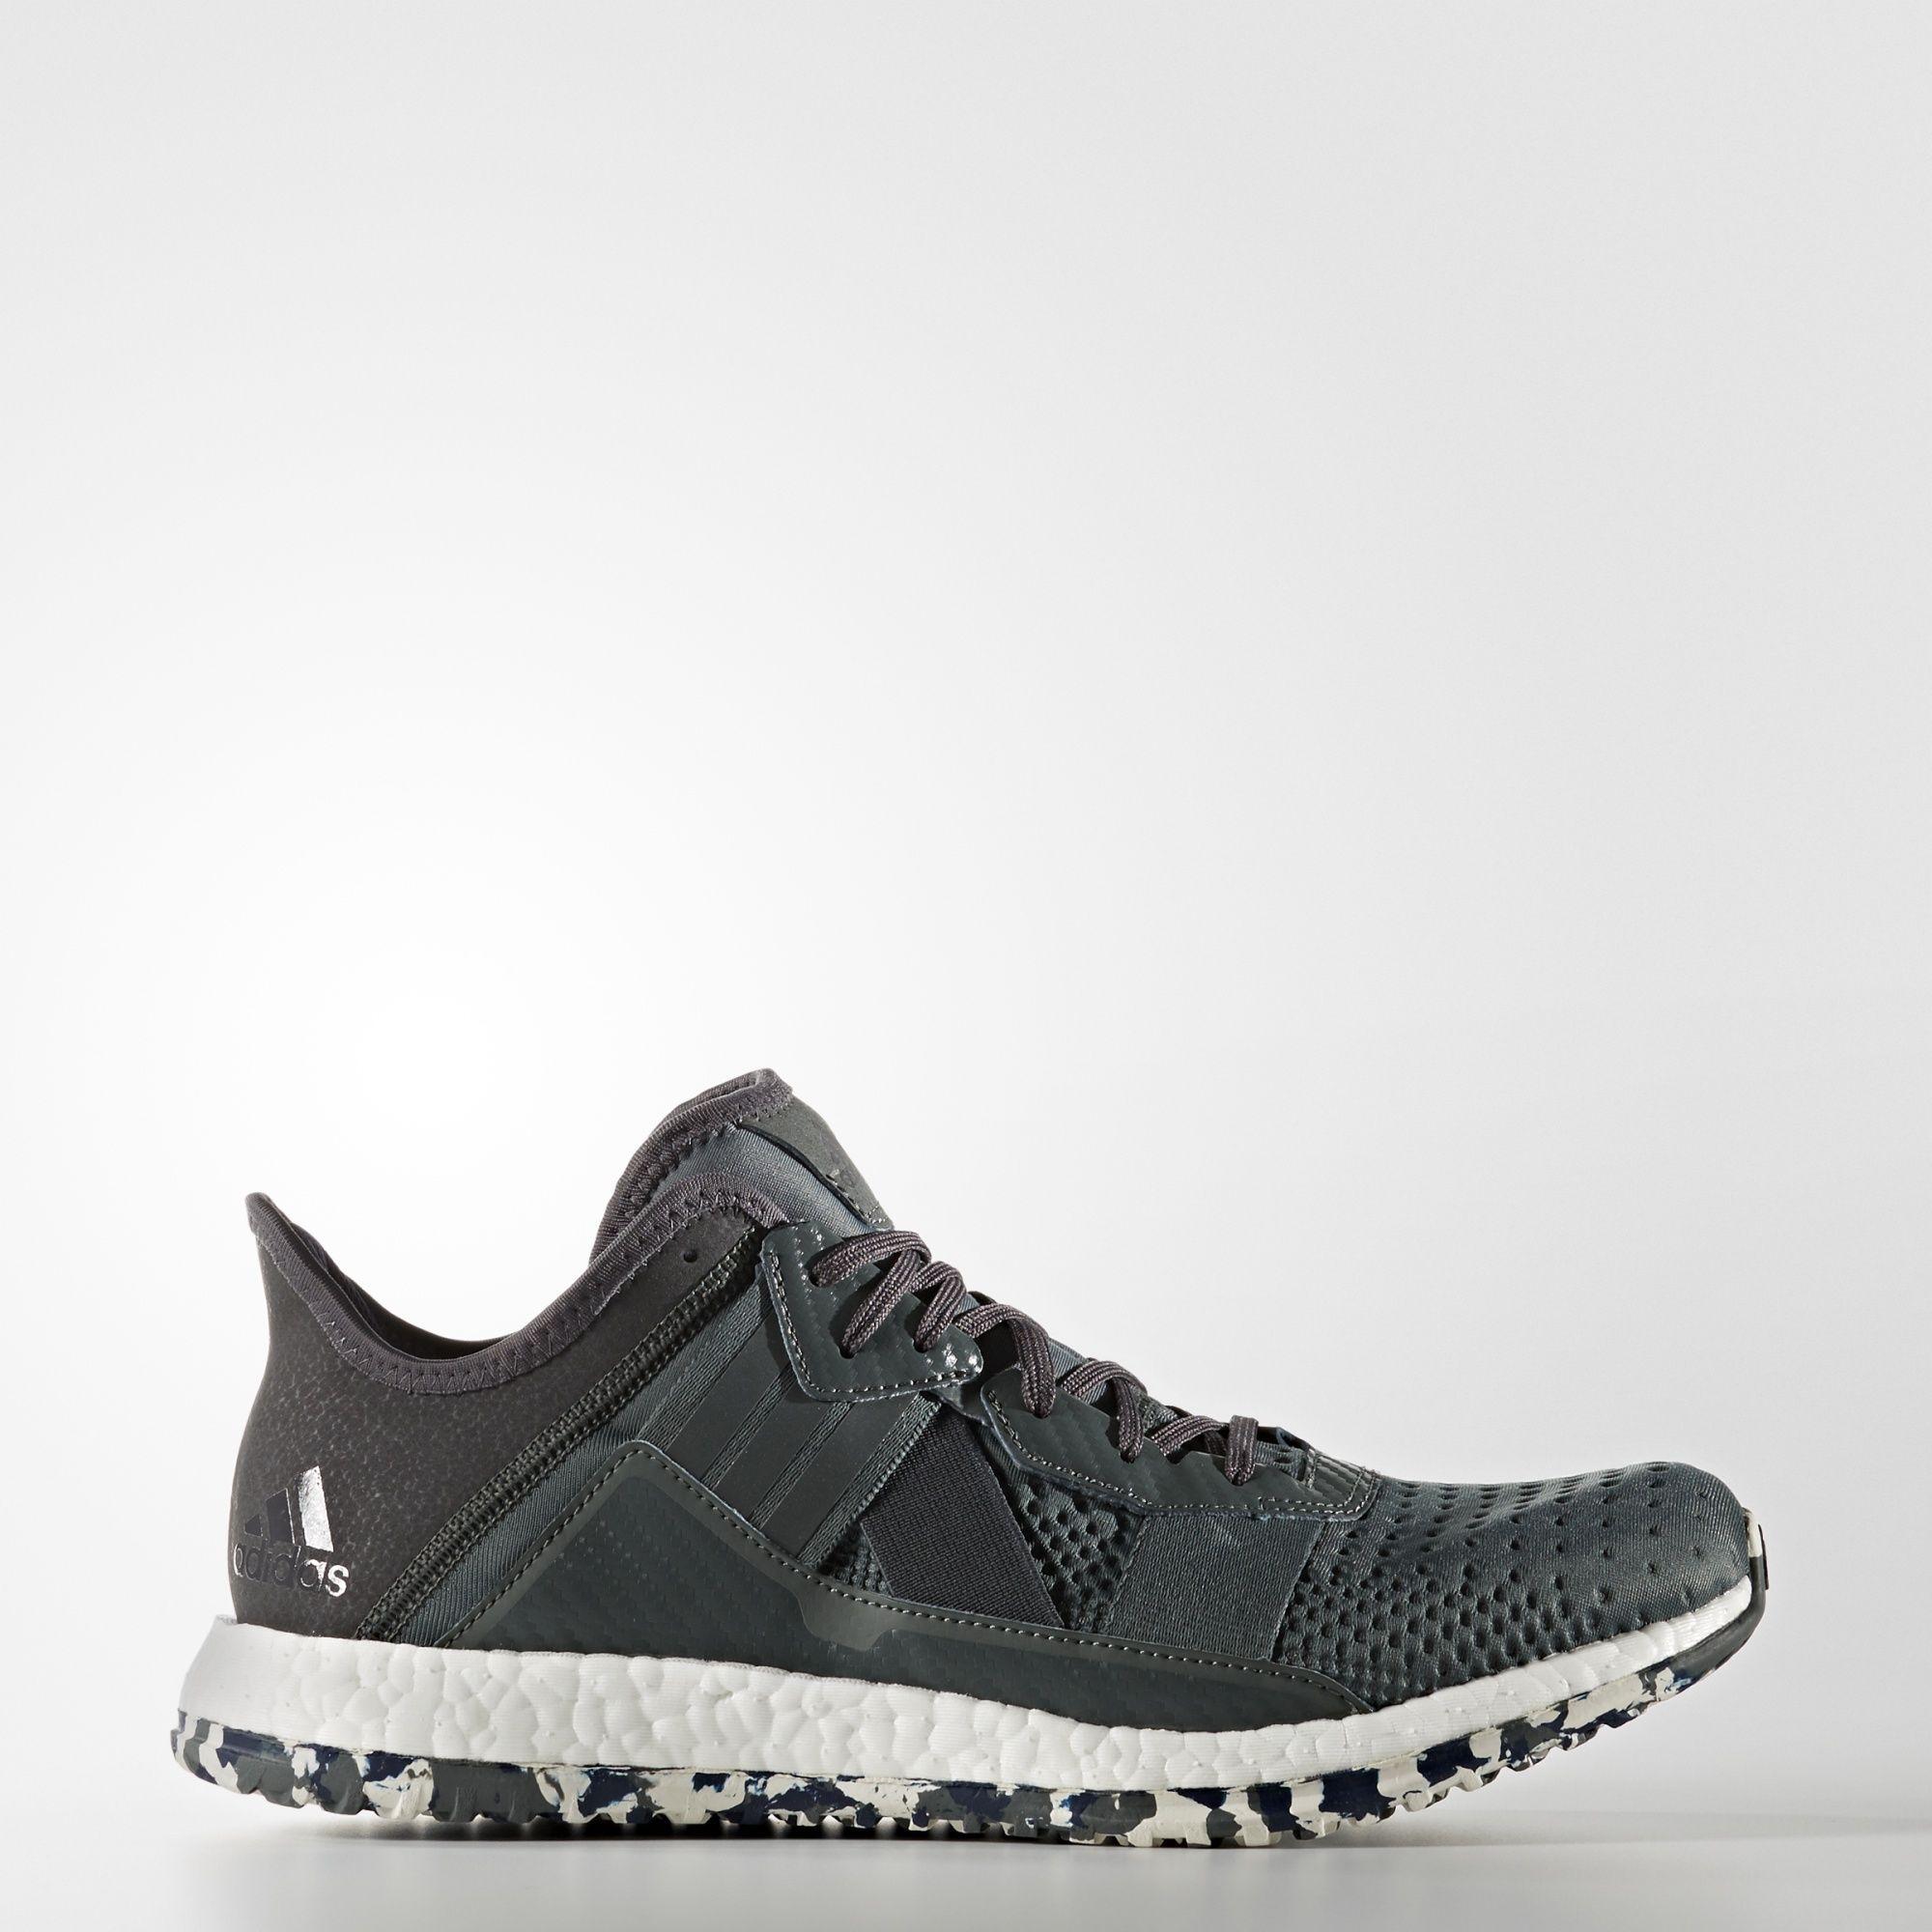 adidas puro slancio zg trainer scarpe palestra pinterest puro slancio